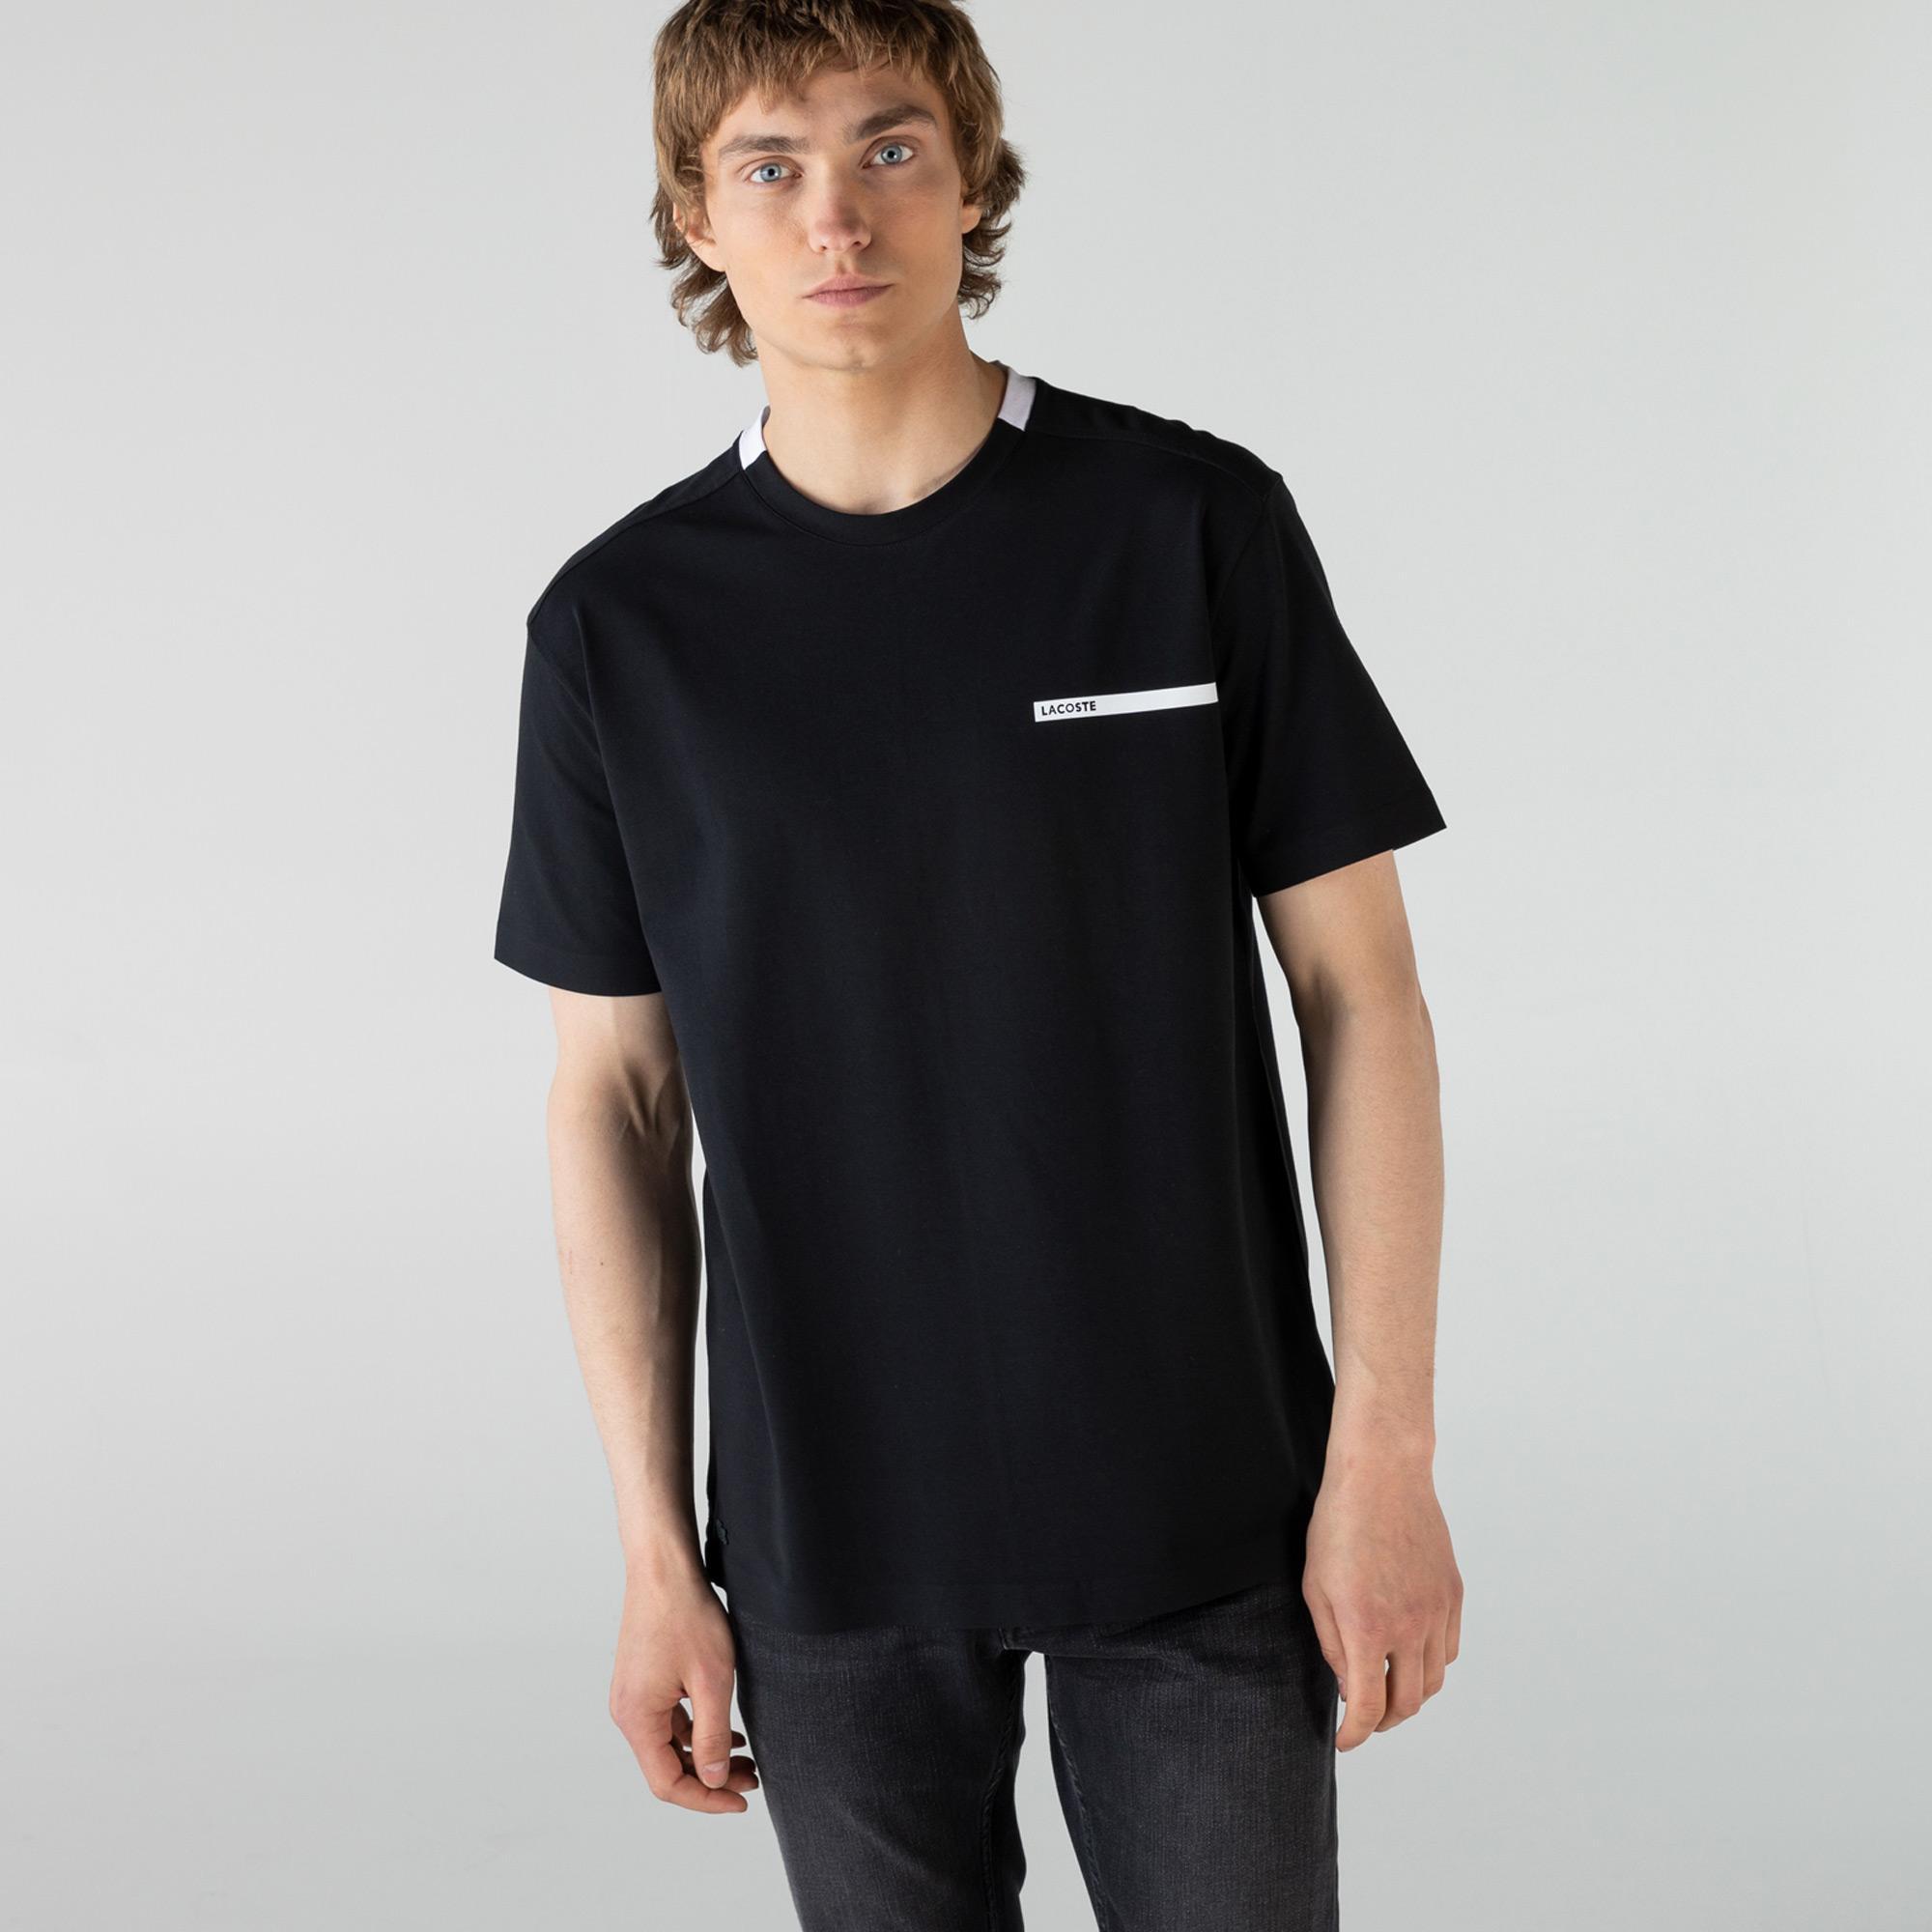 Lacoste Erkek Rahat Fit Bisiklet Yaka Siyah T-Shirt